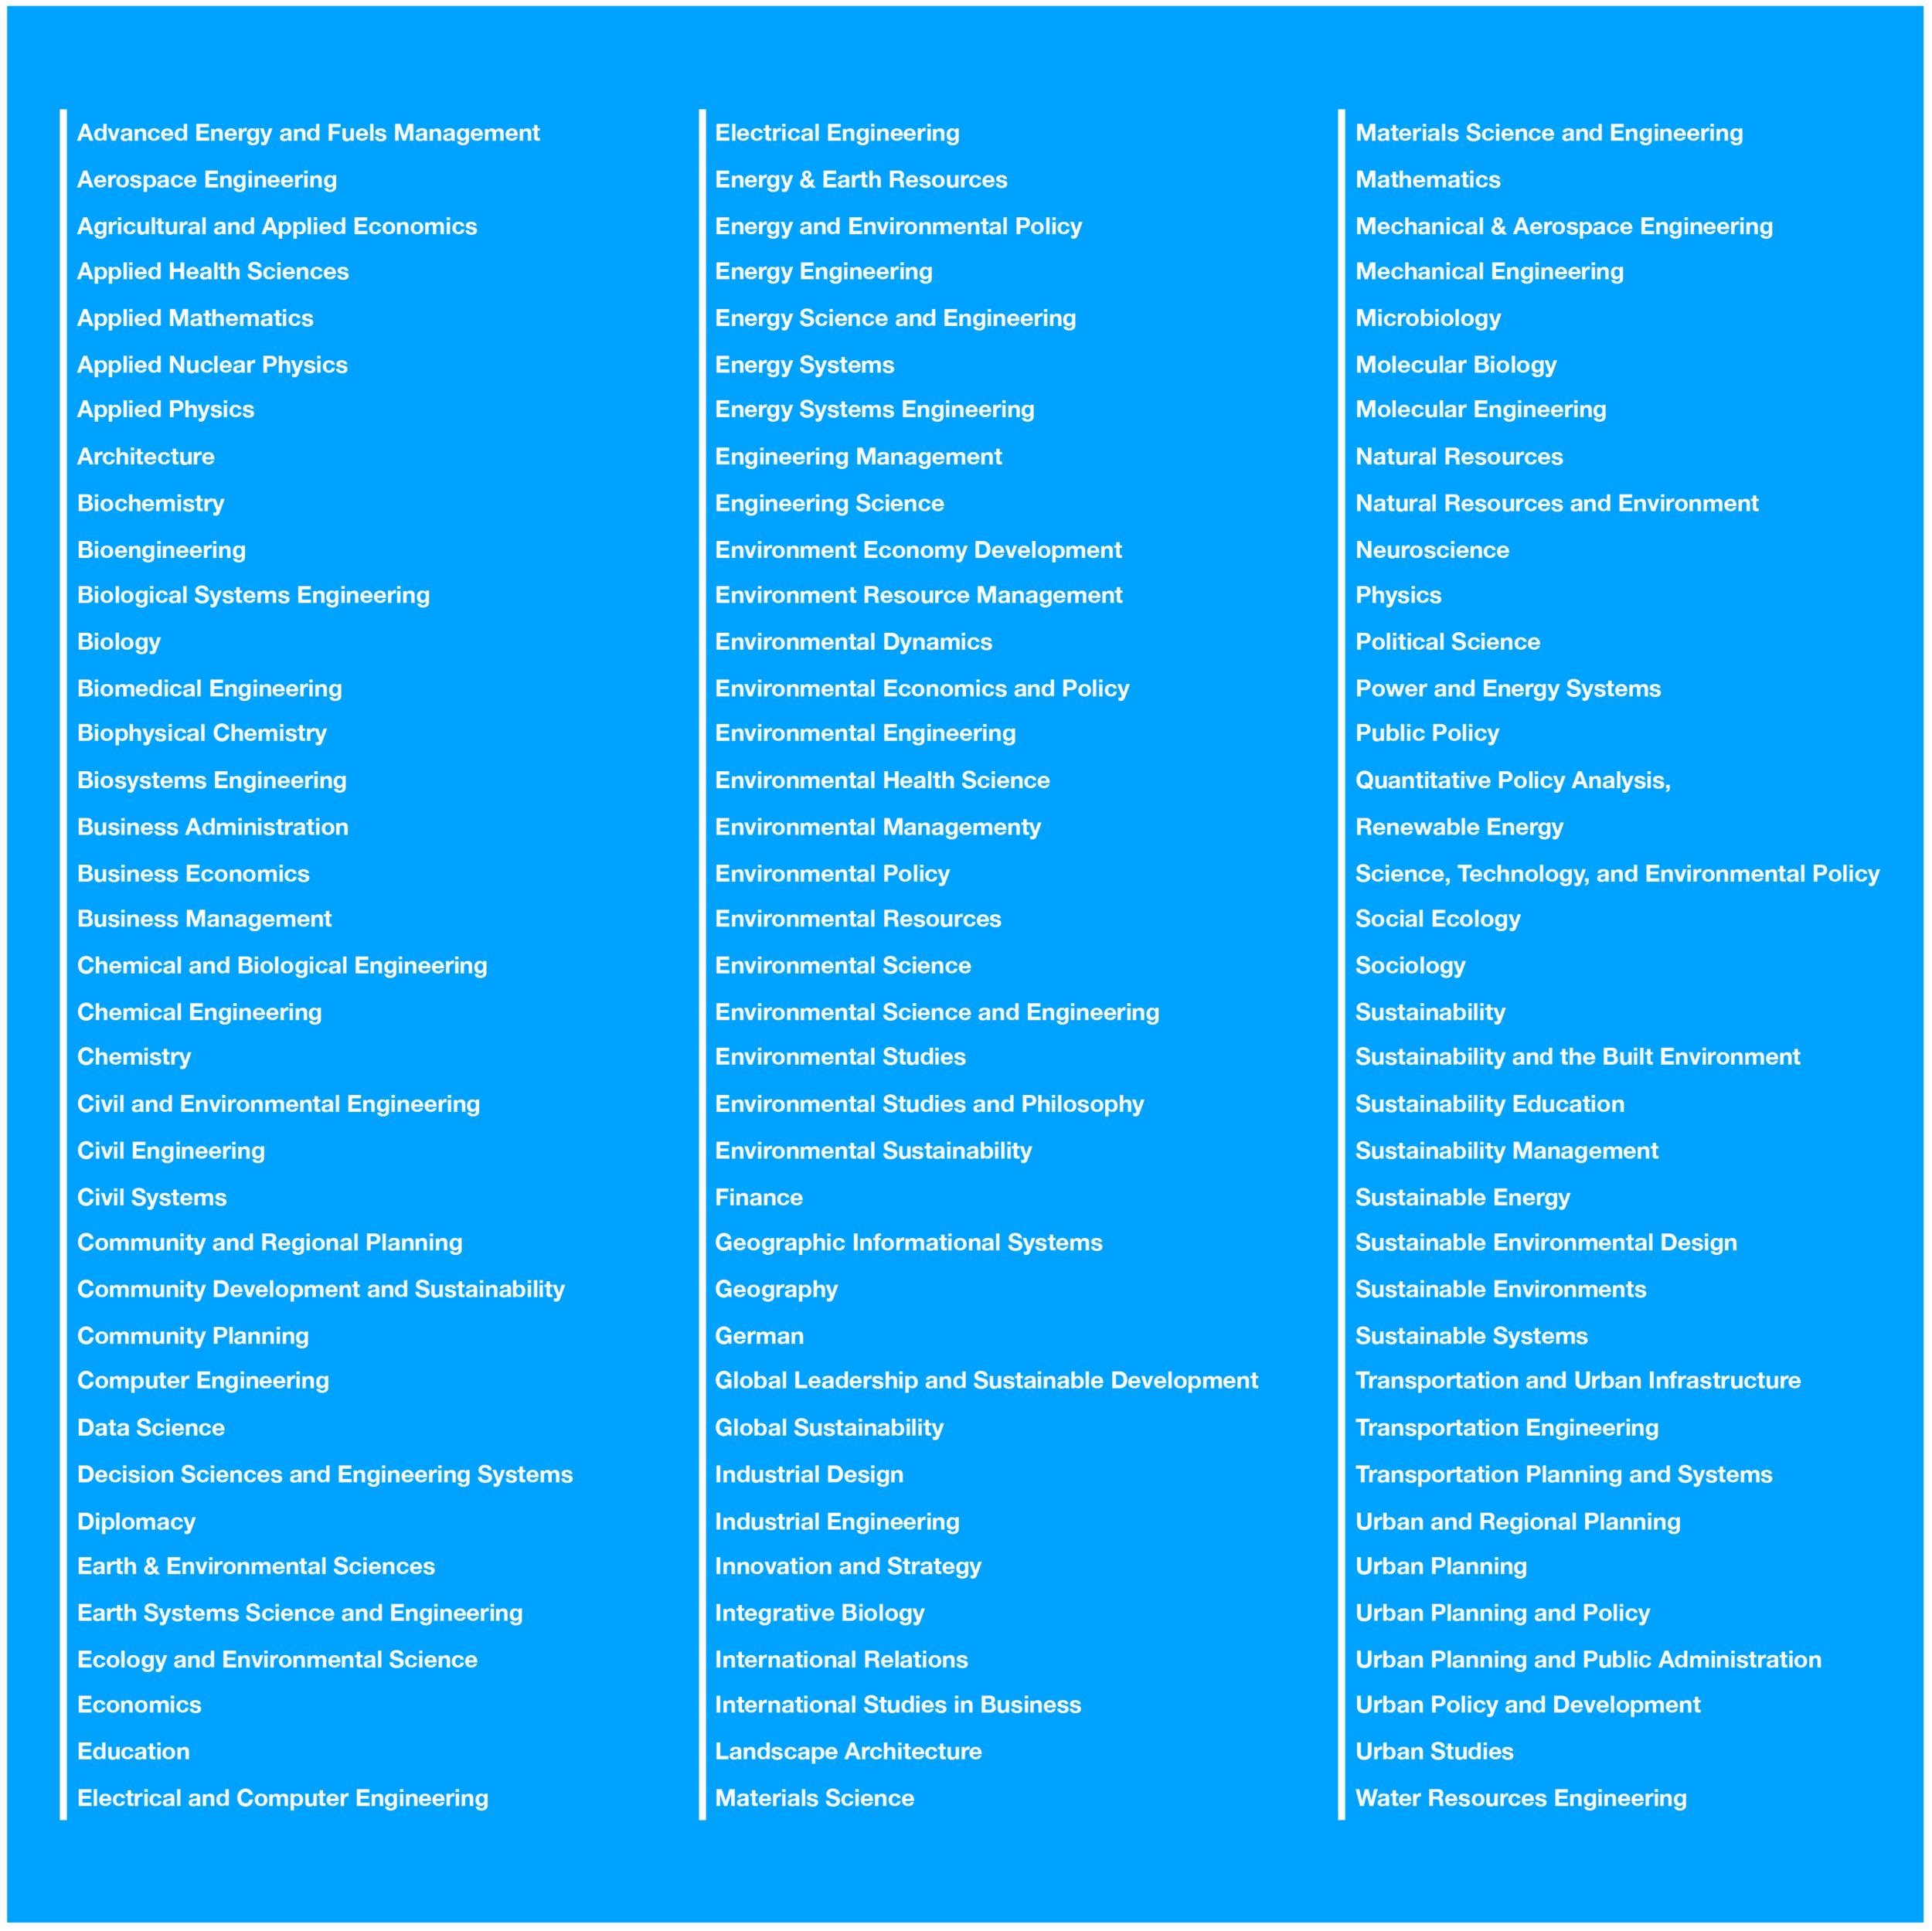 Academic Background (Major)